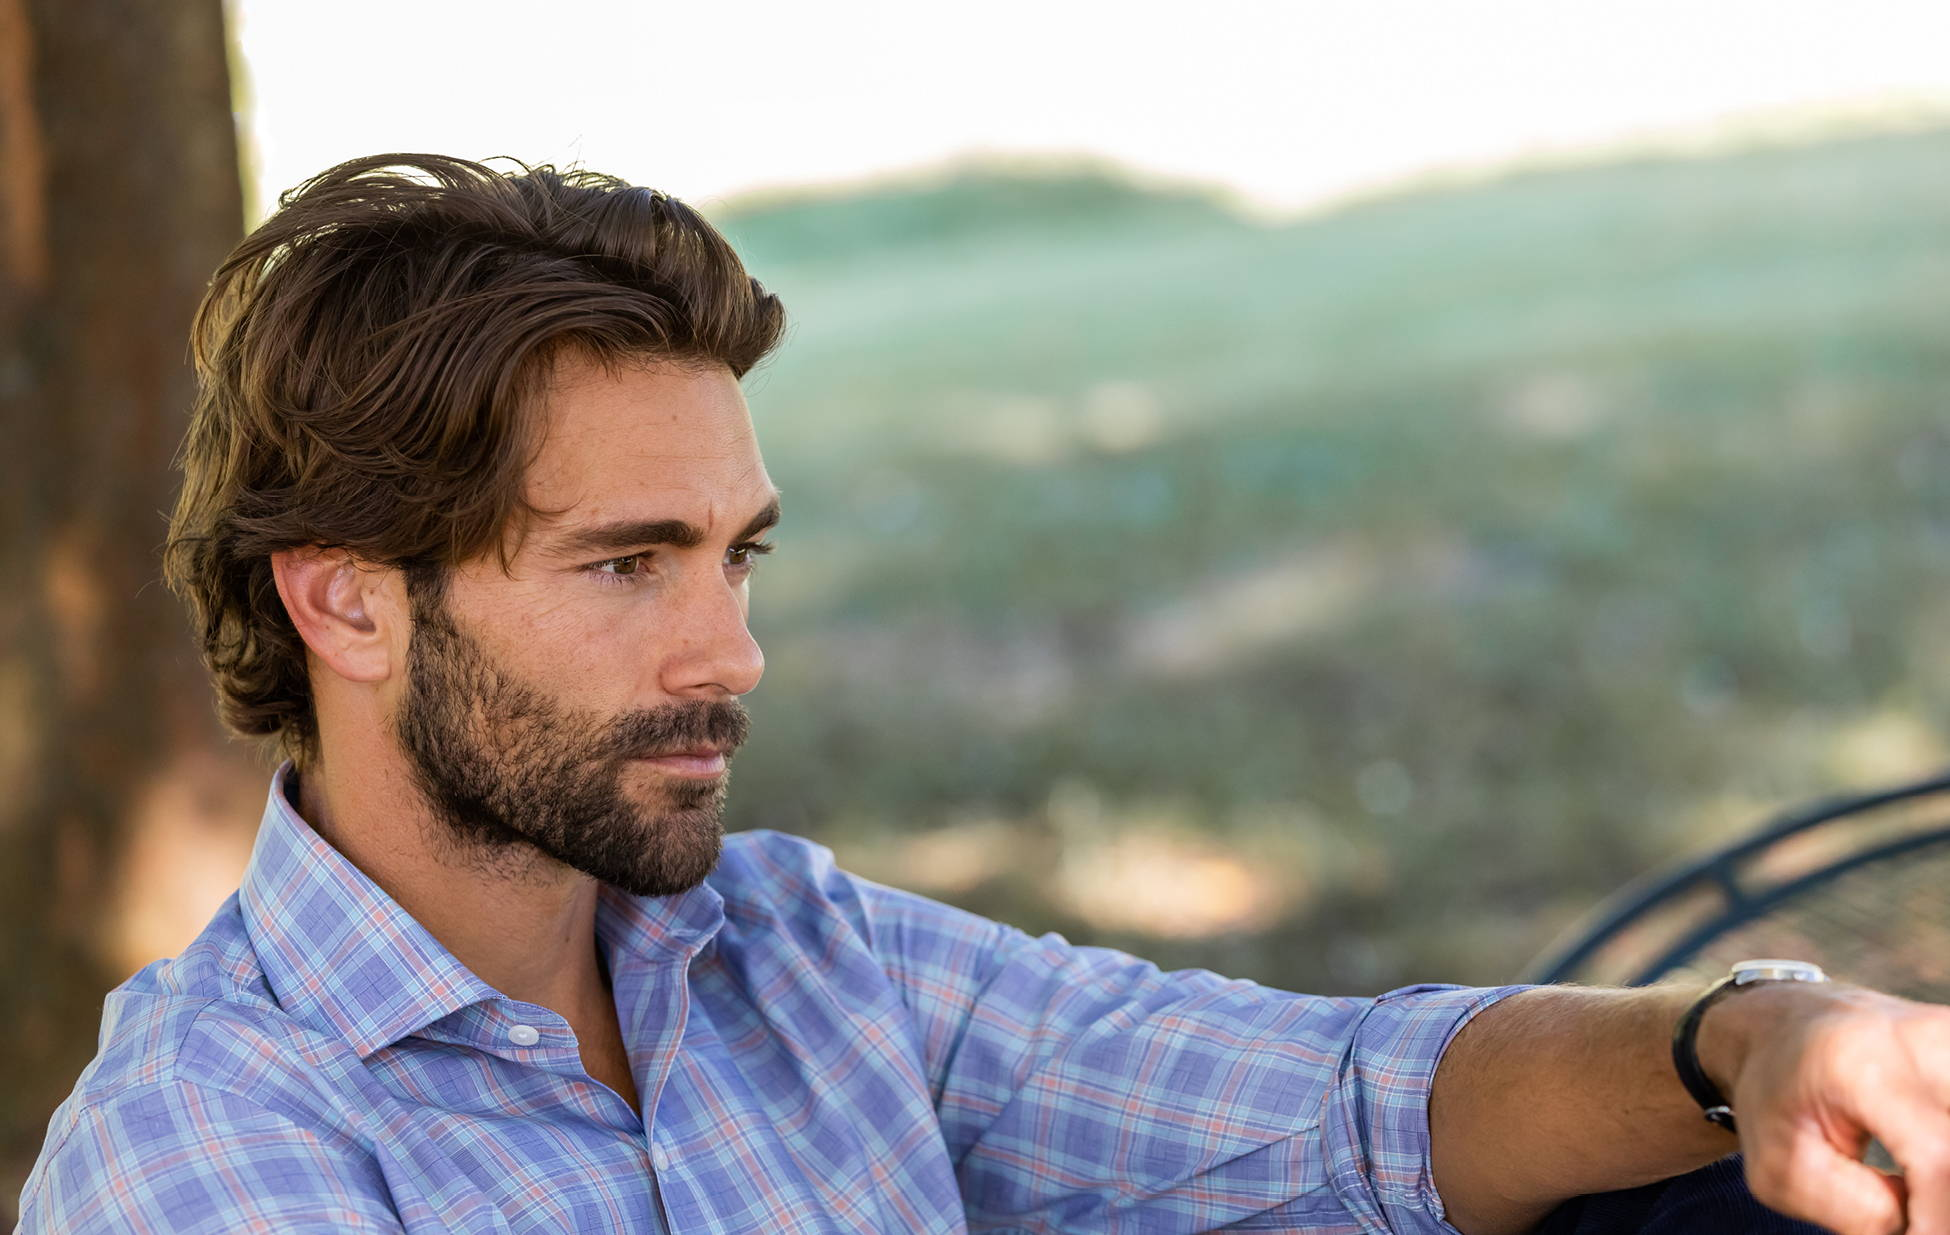 A man outdoors wearing the Khal Check casual shirt.